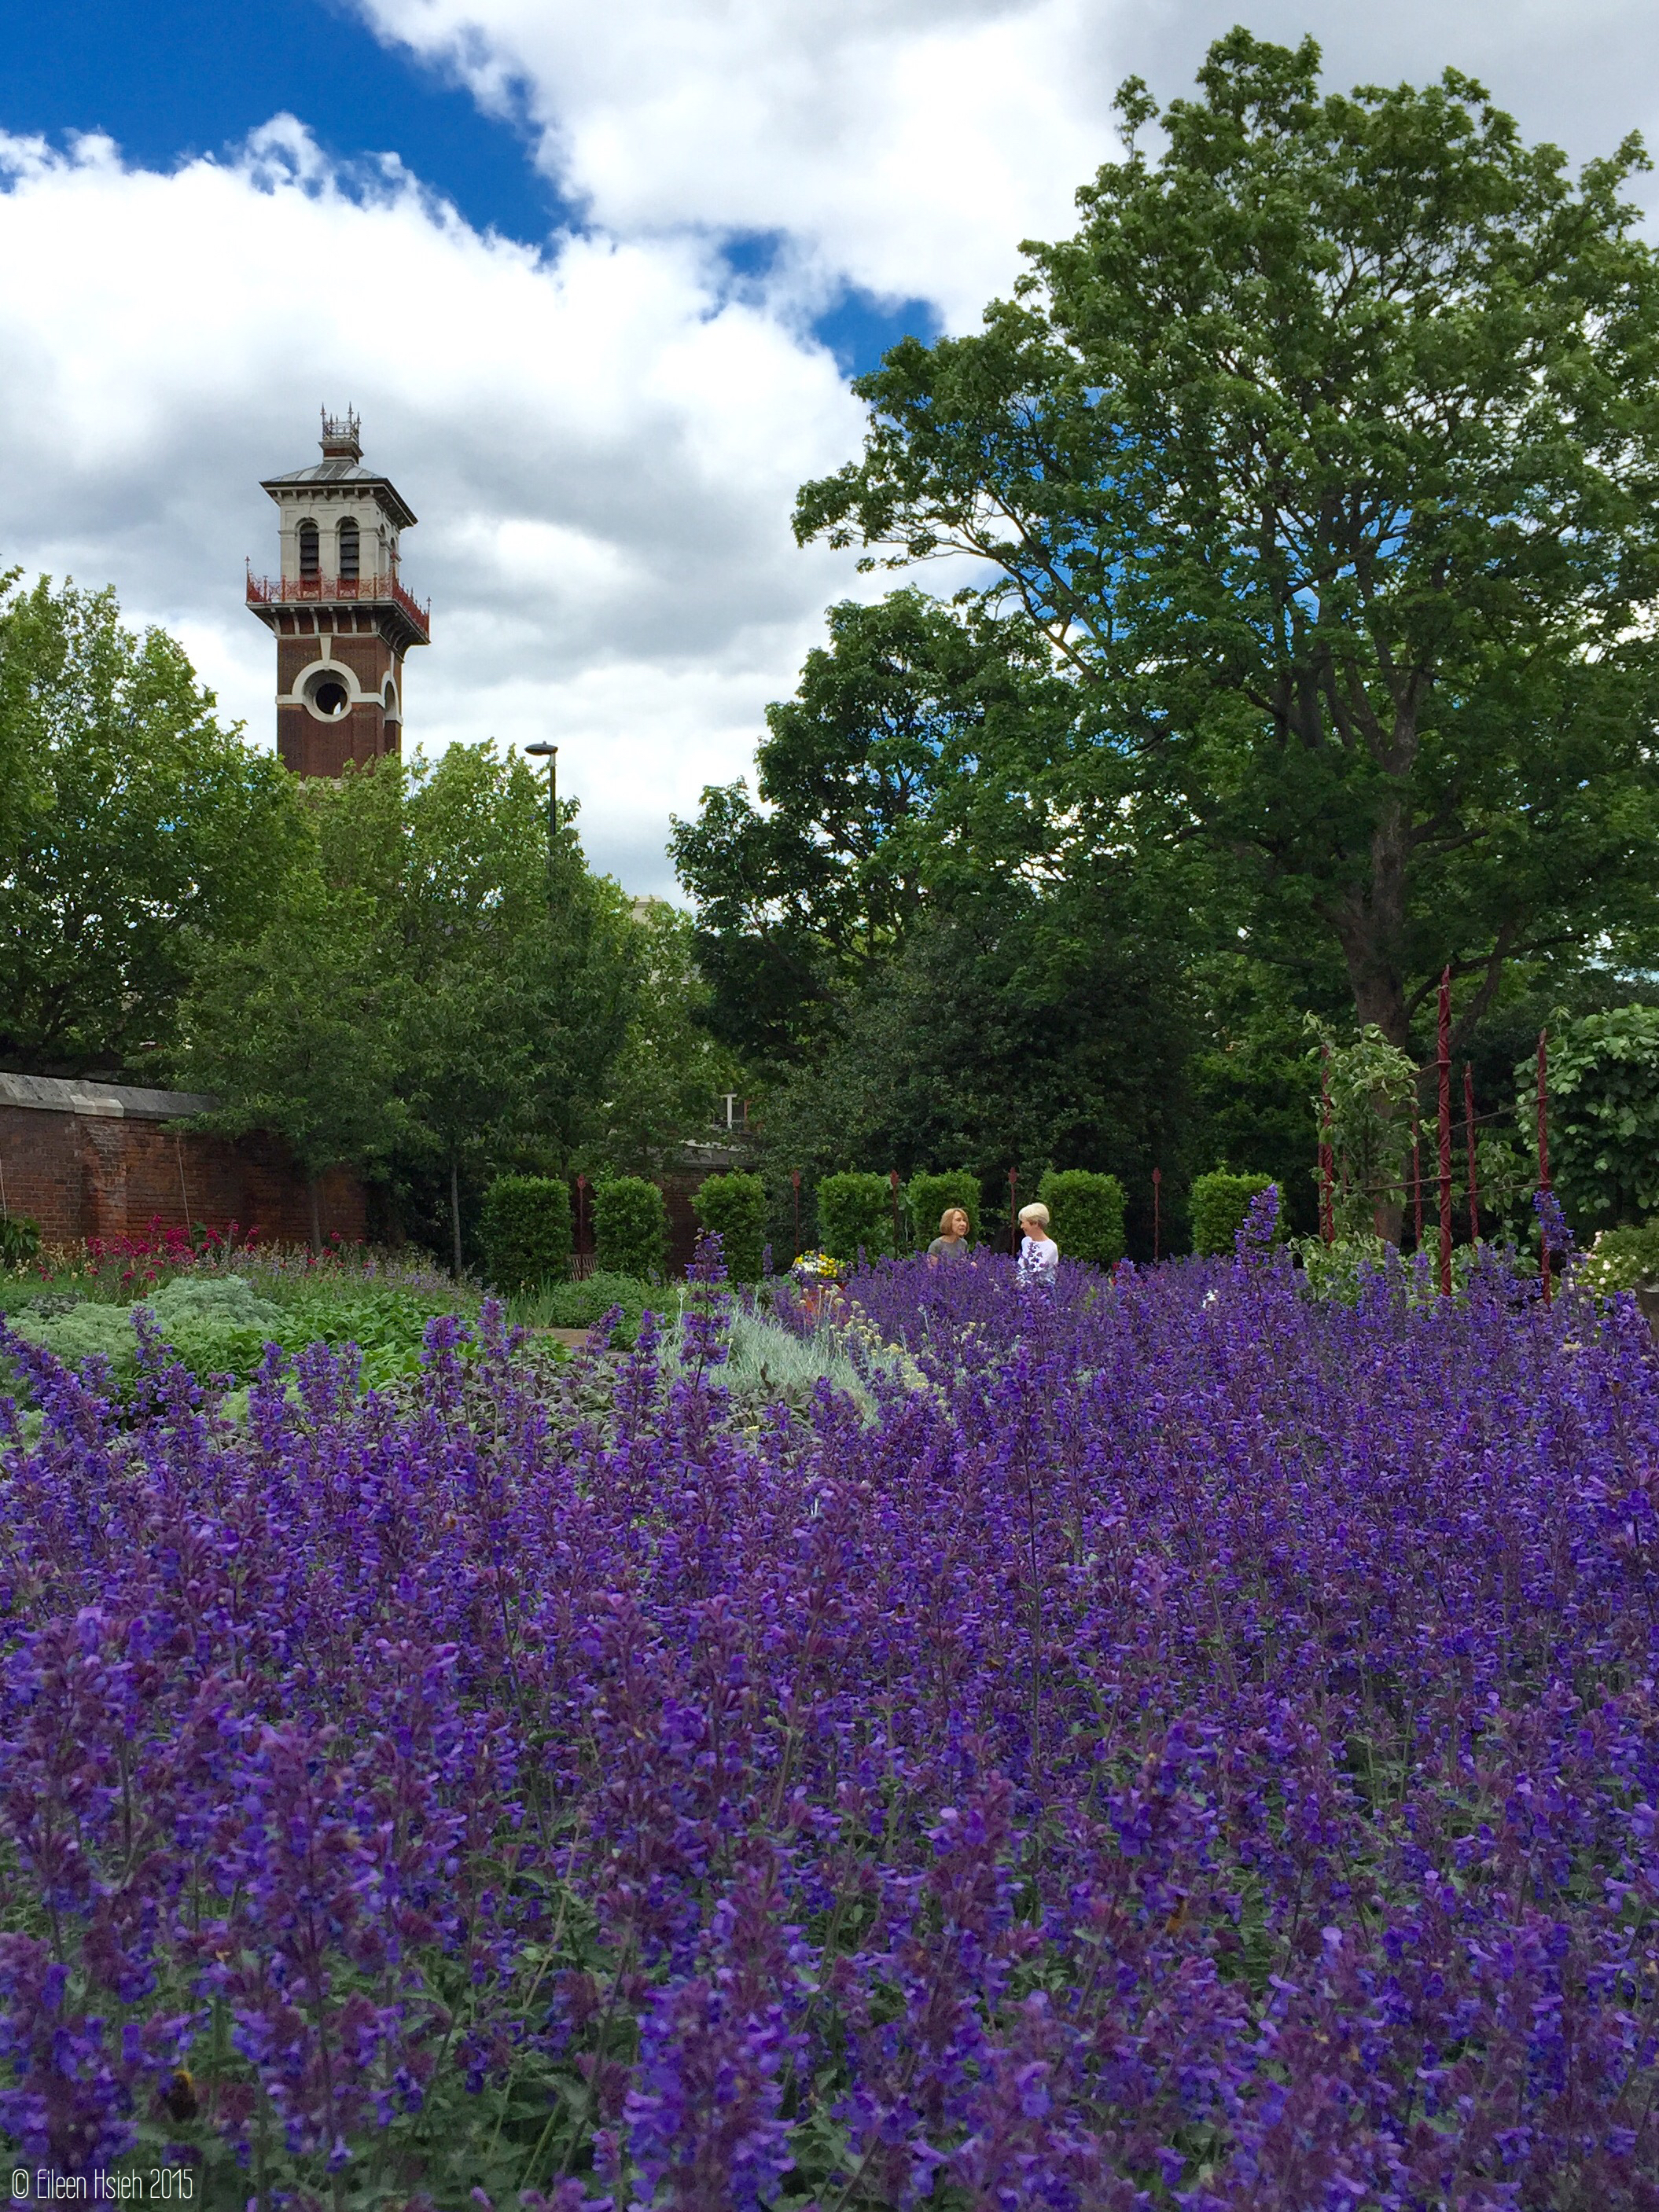 Lambeth Palace Garden London lavender followthatbug follow that bug.JPG